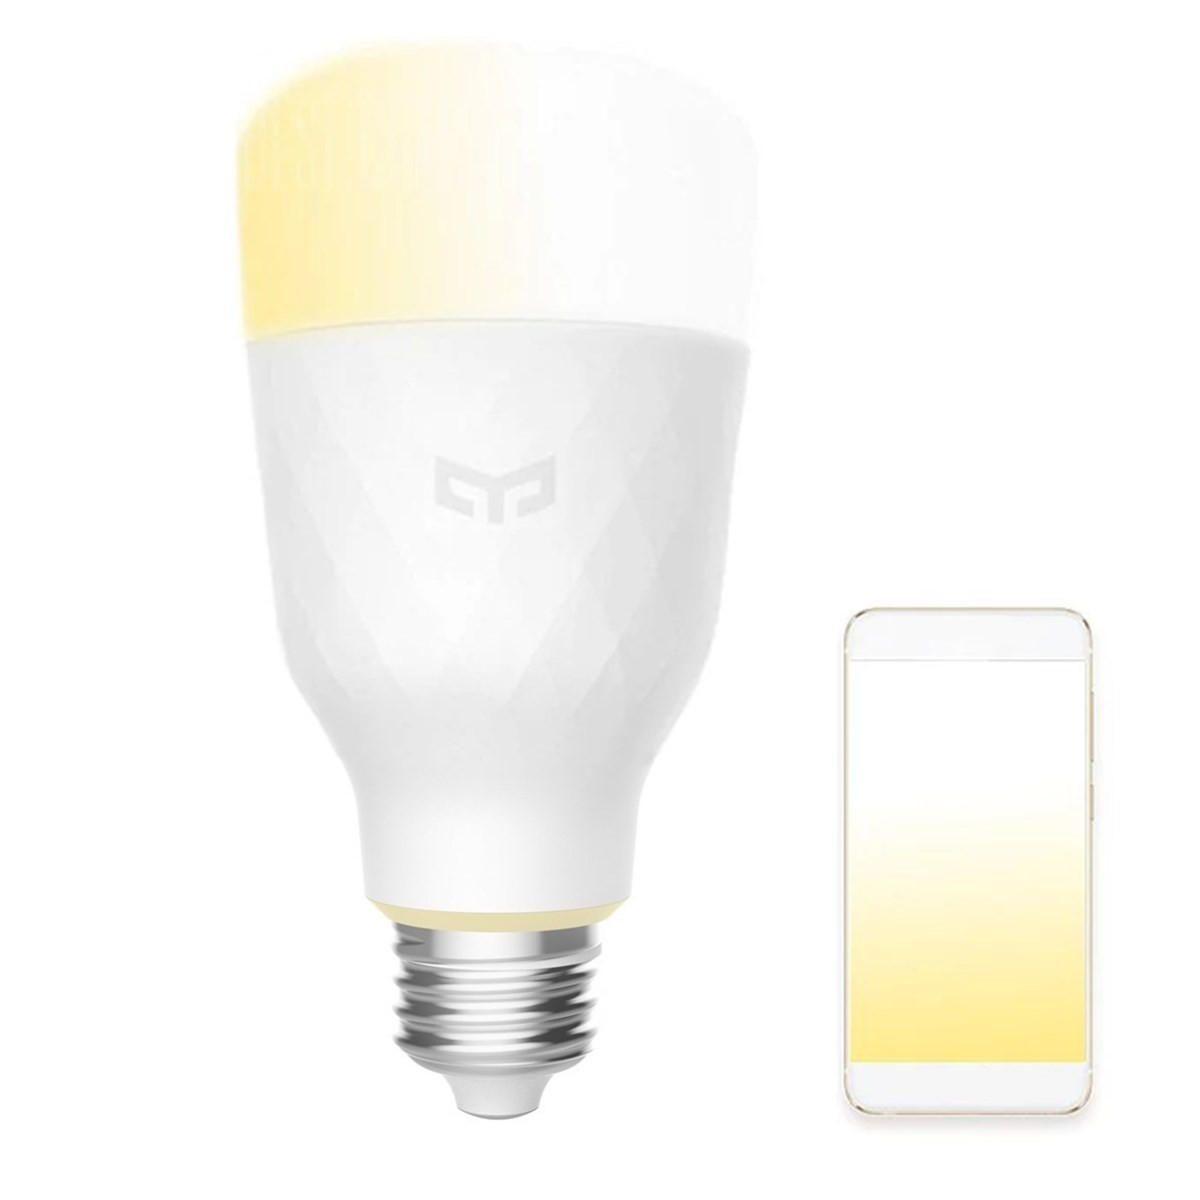 Yeelight YLDP05YL E27 10W Warm White to Daywhite WiFi APP Smart LED Bulb AC100 240V(Xiaomi Ecosystem Product)